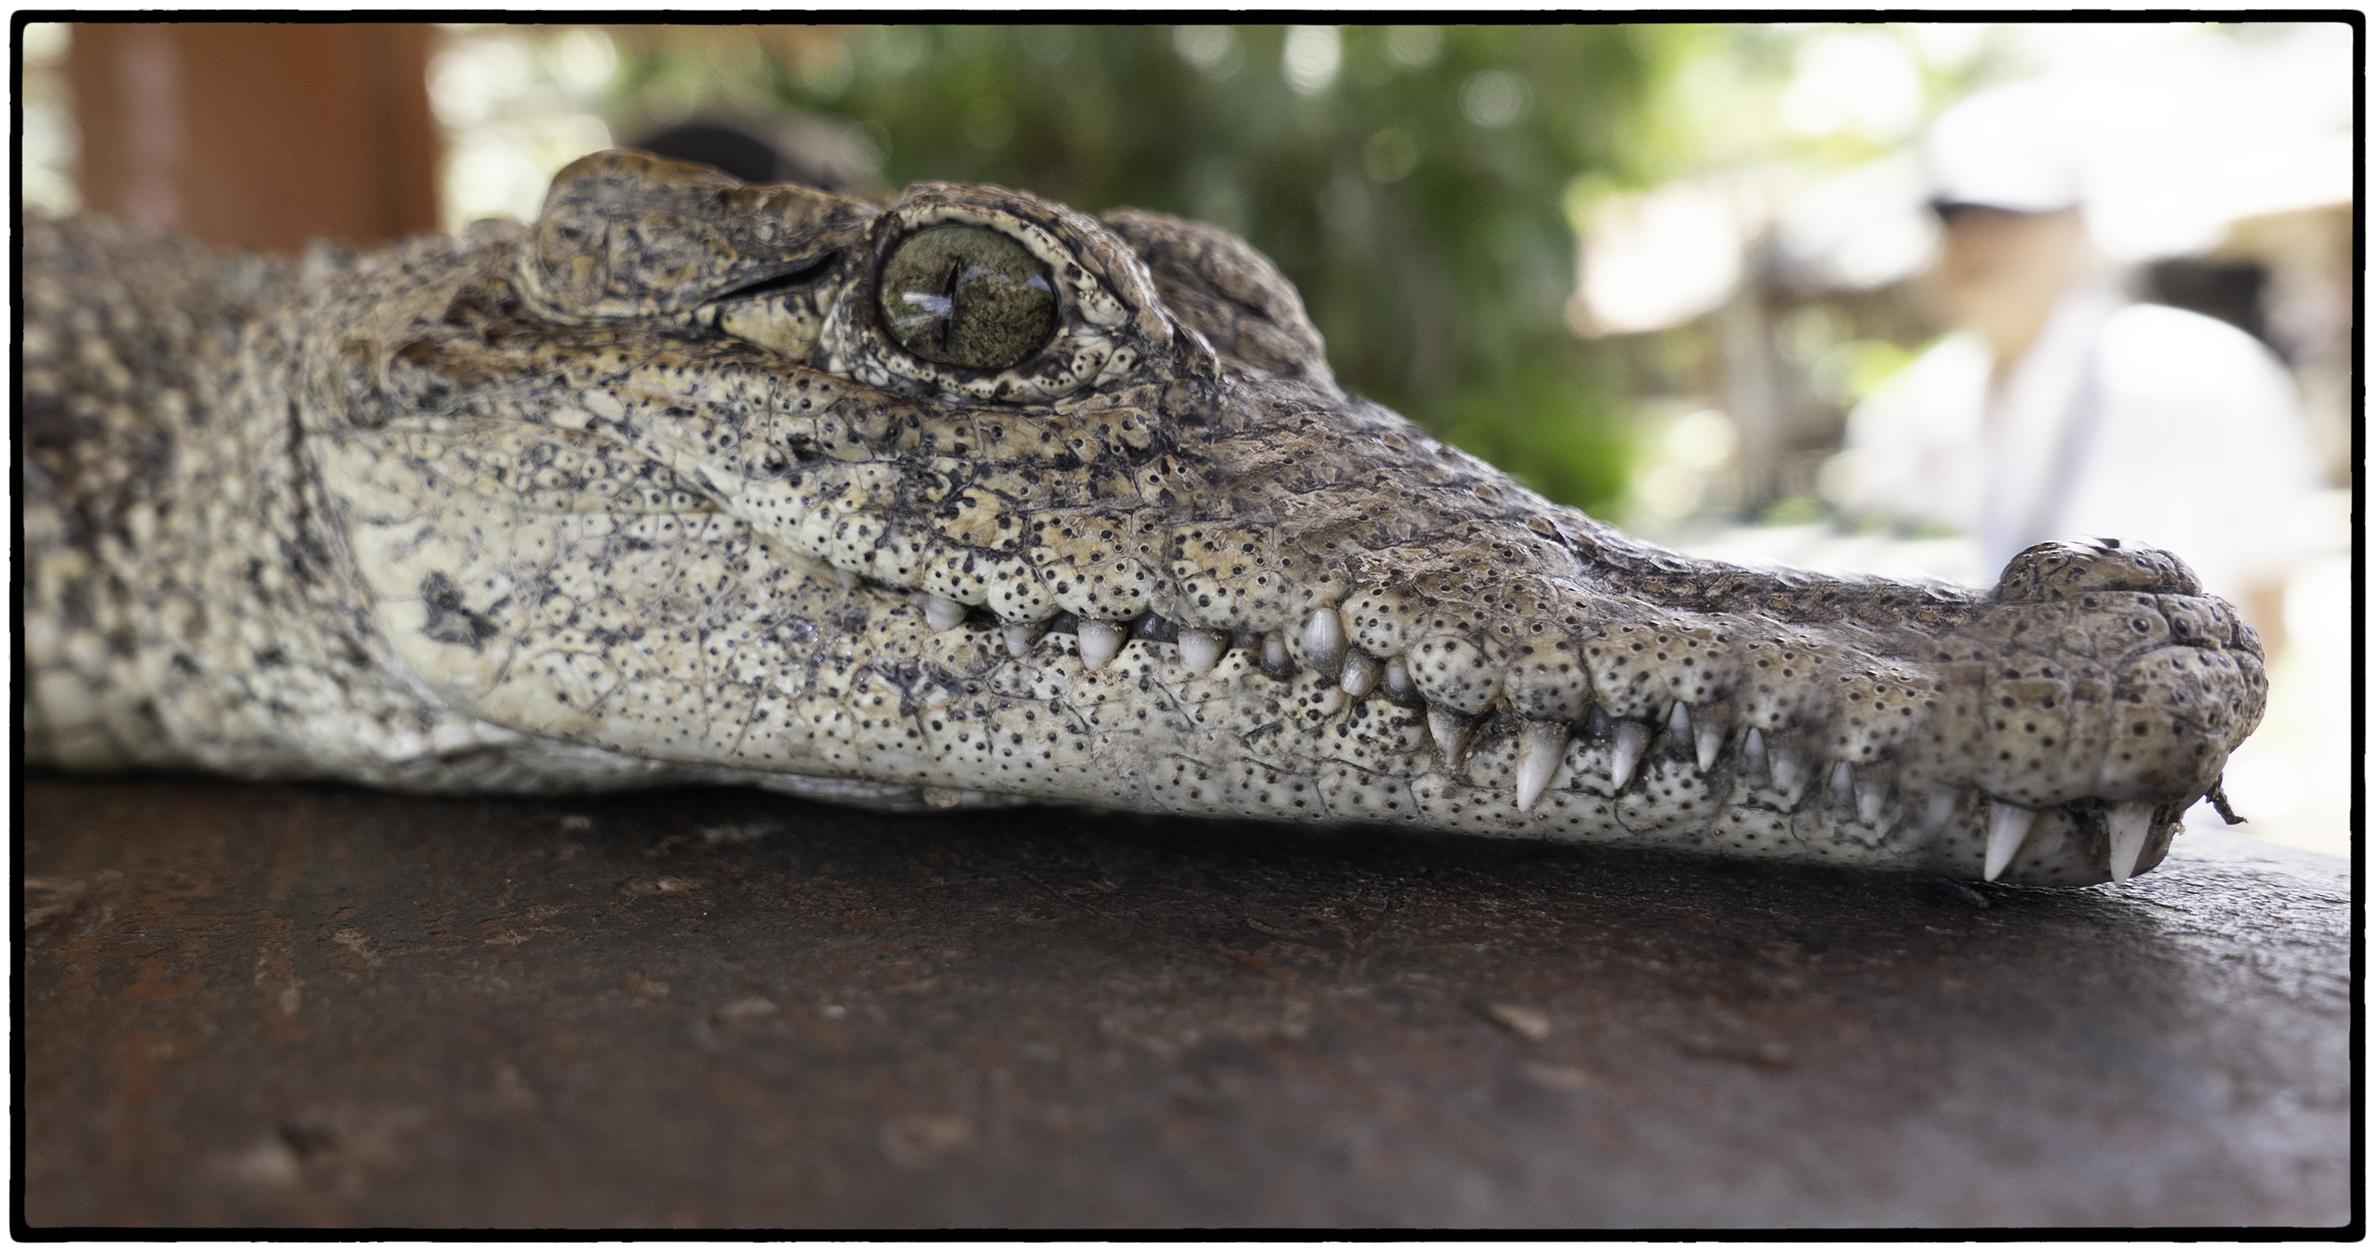 Juvenile crocodile, Matanzas, Cuba